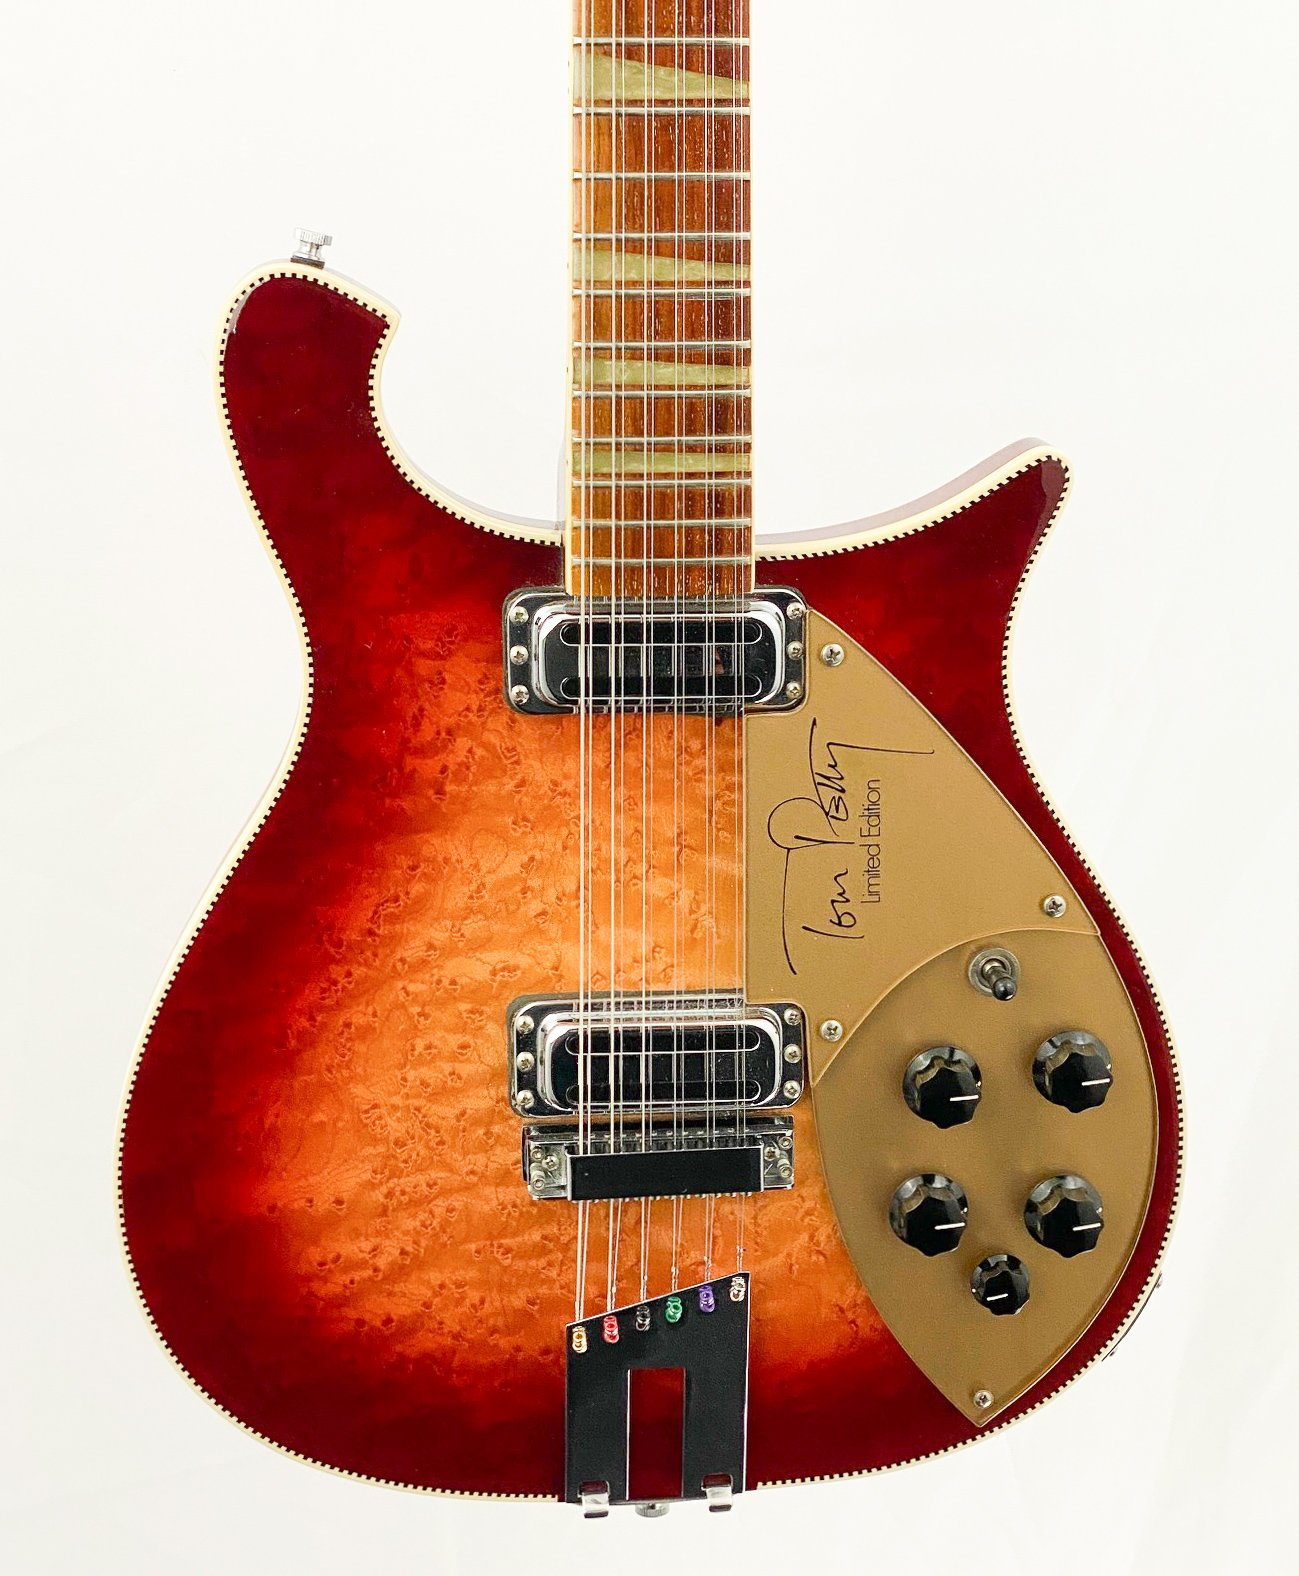 1991 Rickenbacker 660-12 Tom Petty Limited Edition 12-string